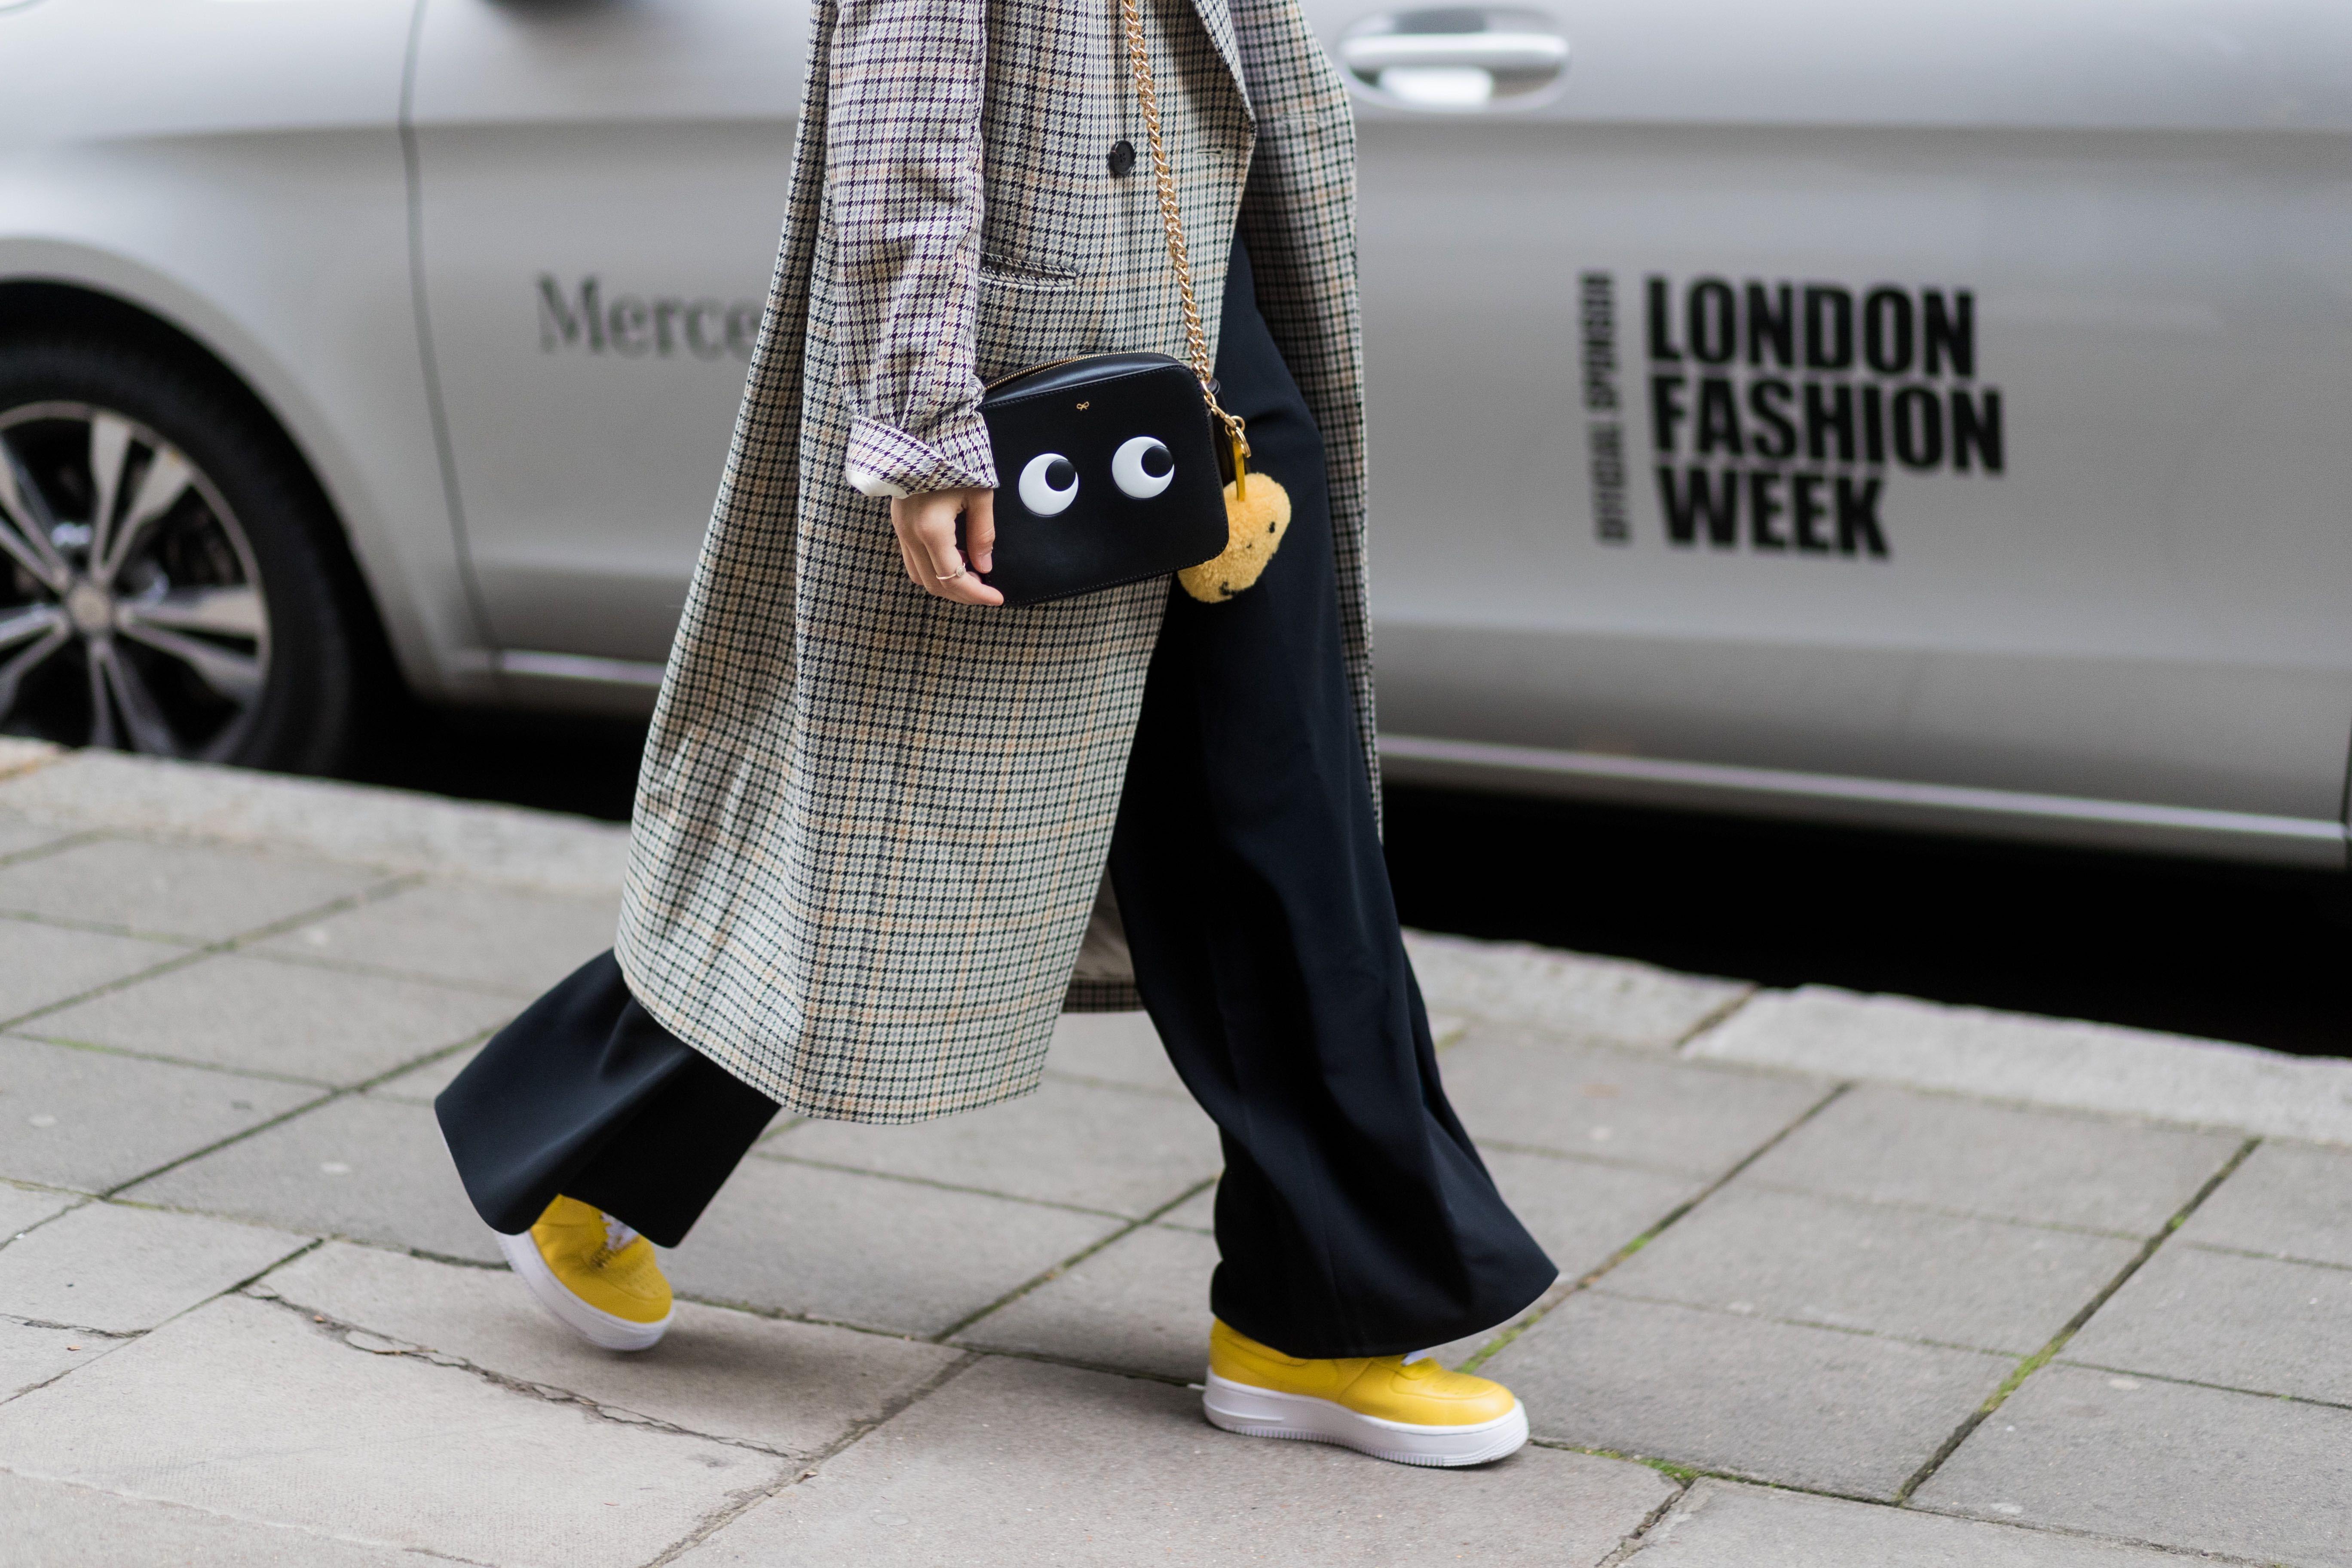 Caroline Daur wears Anya Hindmarch 'Eyes' bag during London Fashion Week in 2017 | Source: Getty Images